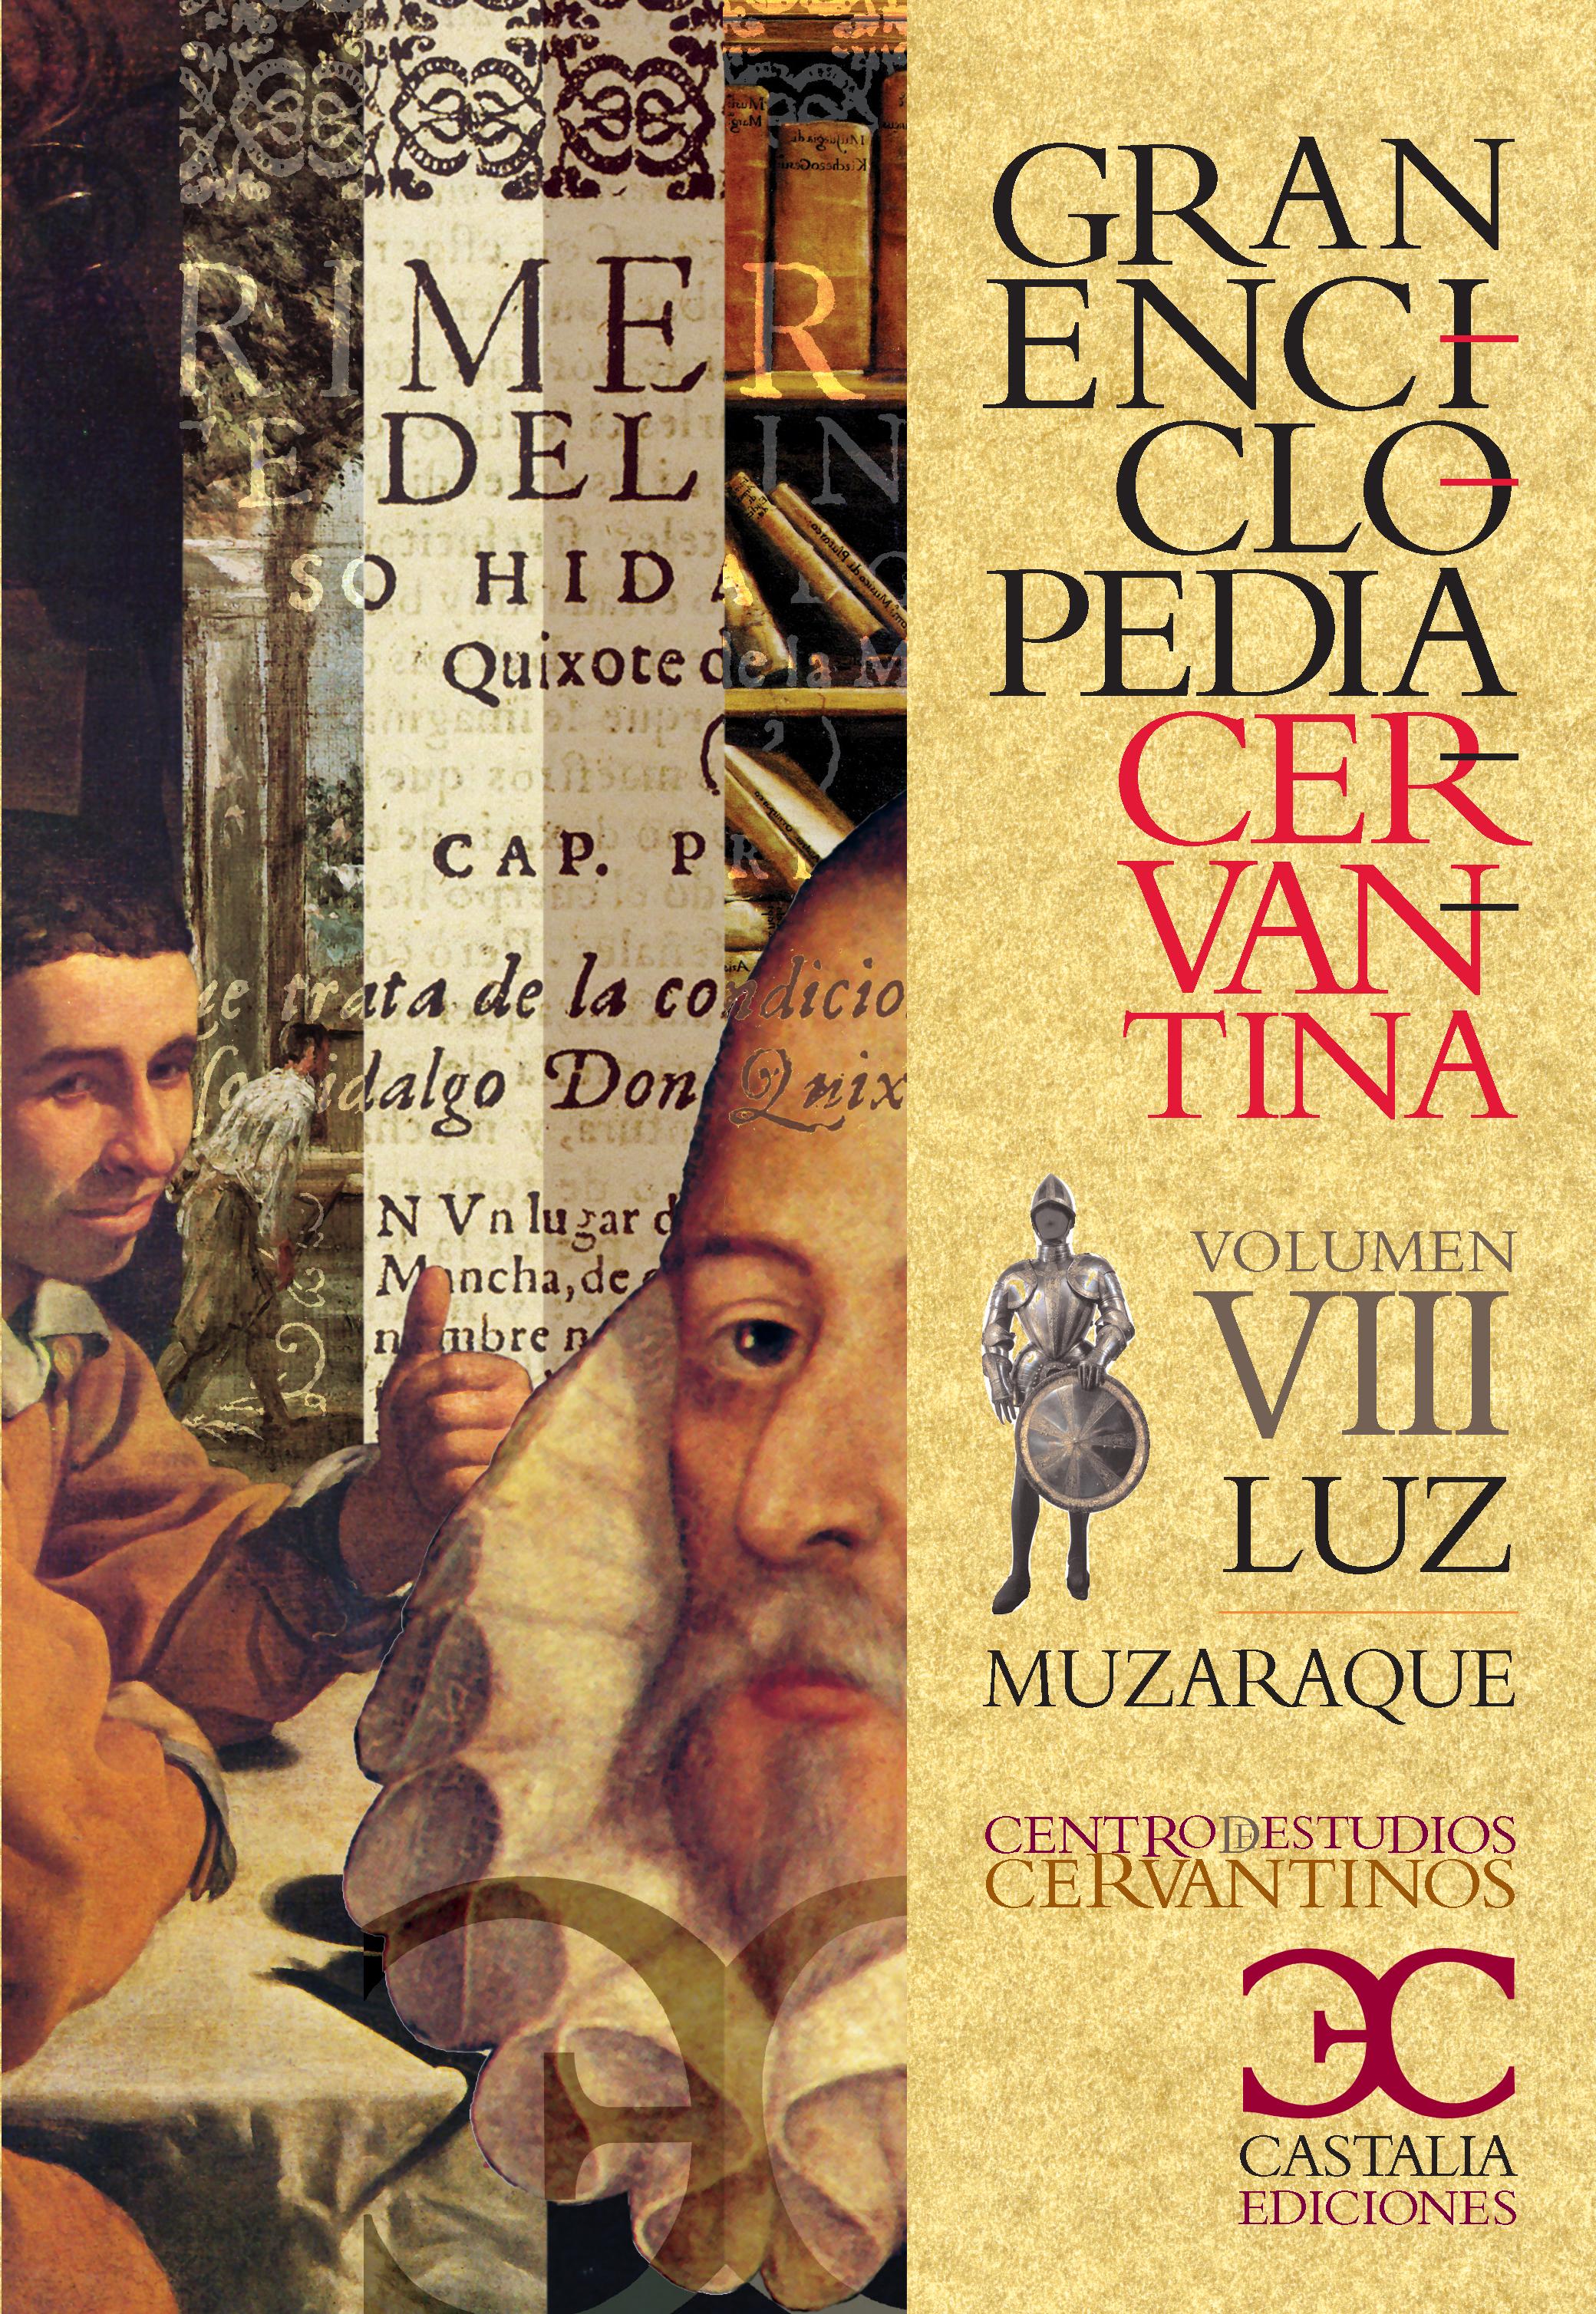 Gran Enciclopedia Cervantina. Volumen VIII. Luz - Muzaraque